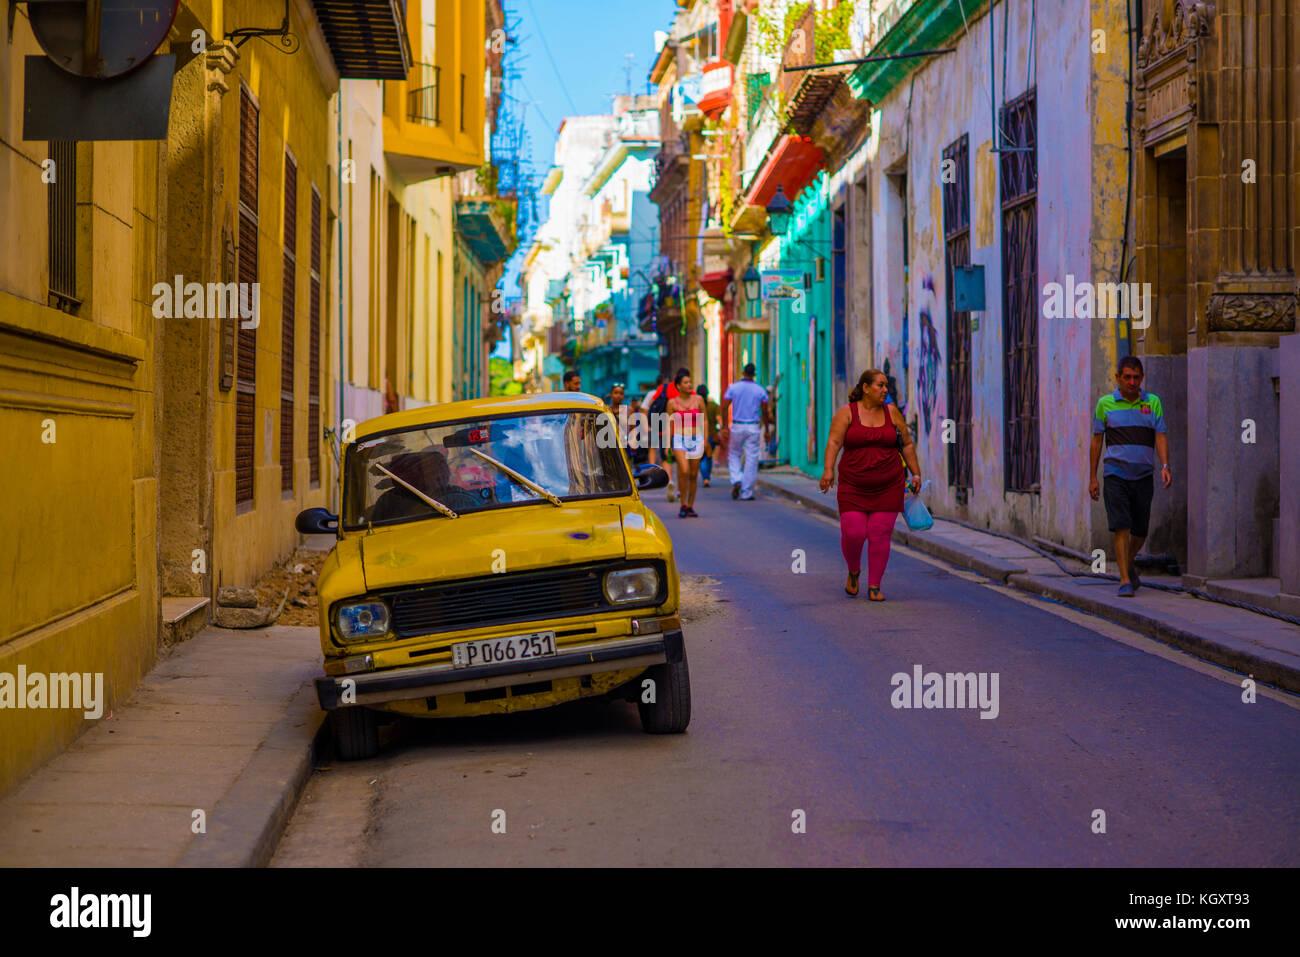 Old car in the shabby street of havana cuba - Stock Image